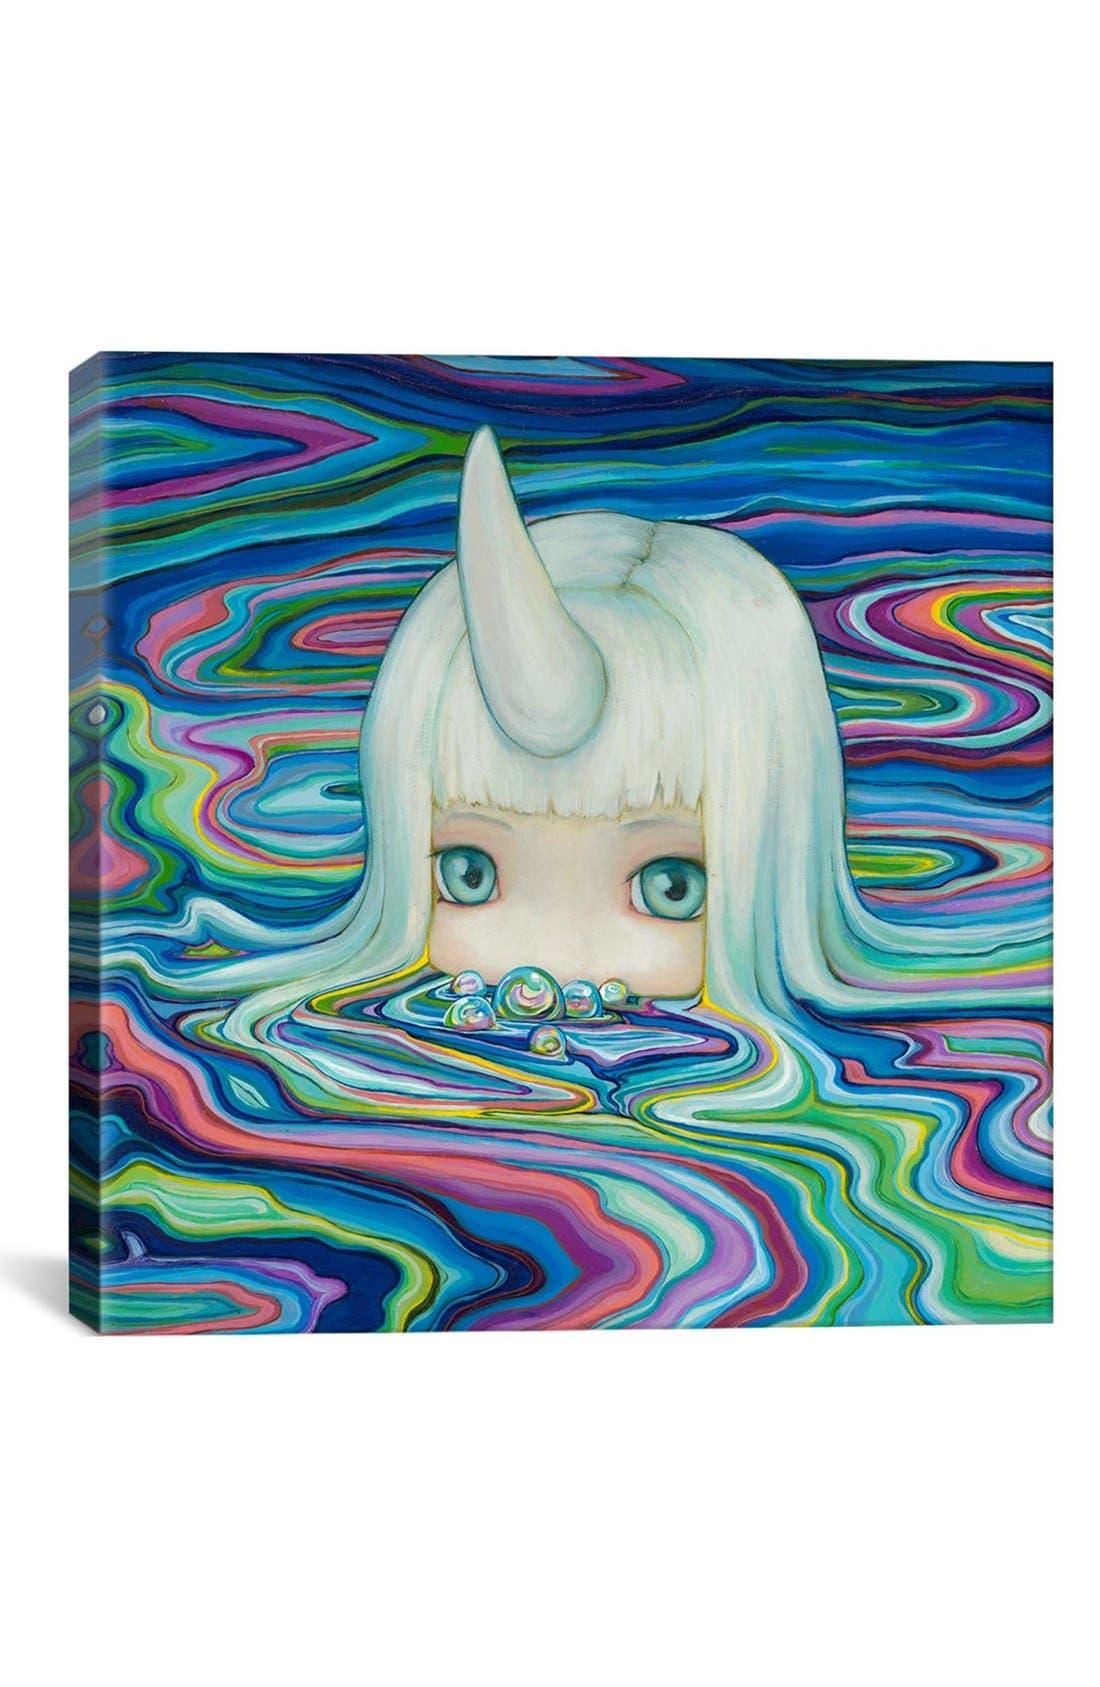 'Bubs - Camilla Derrico' Giclée Print Canvas Art,                         Main,                         color, Blue/ Multi